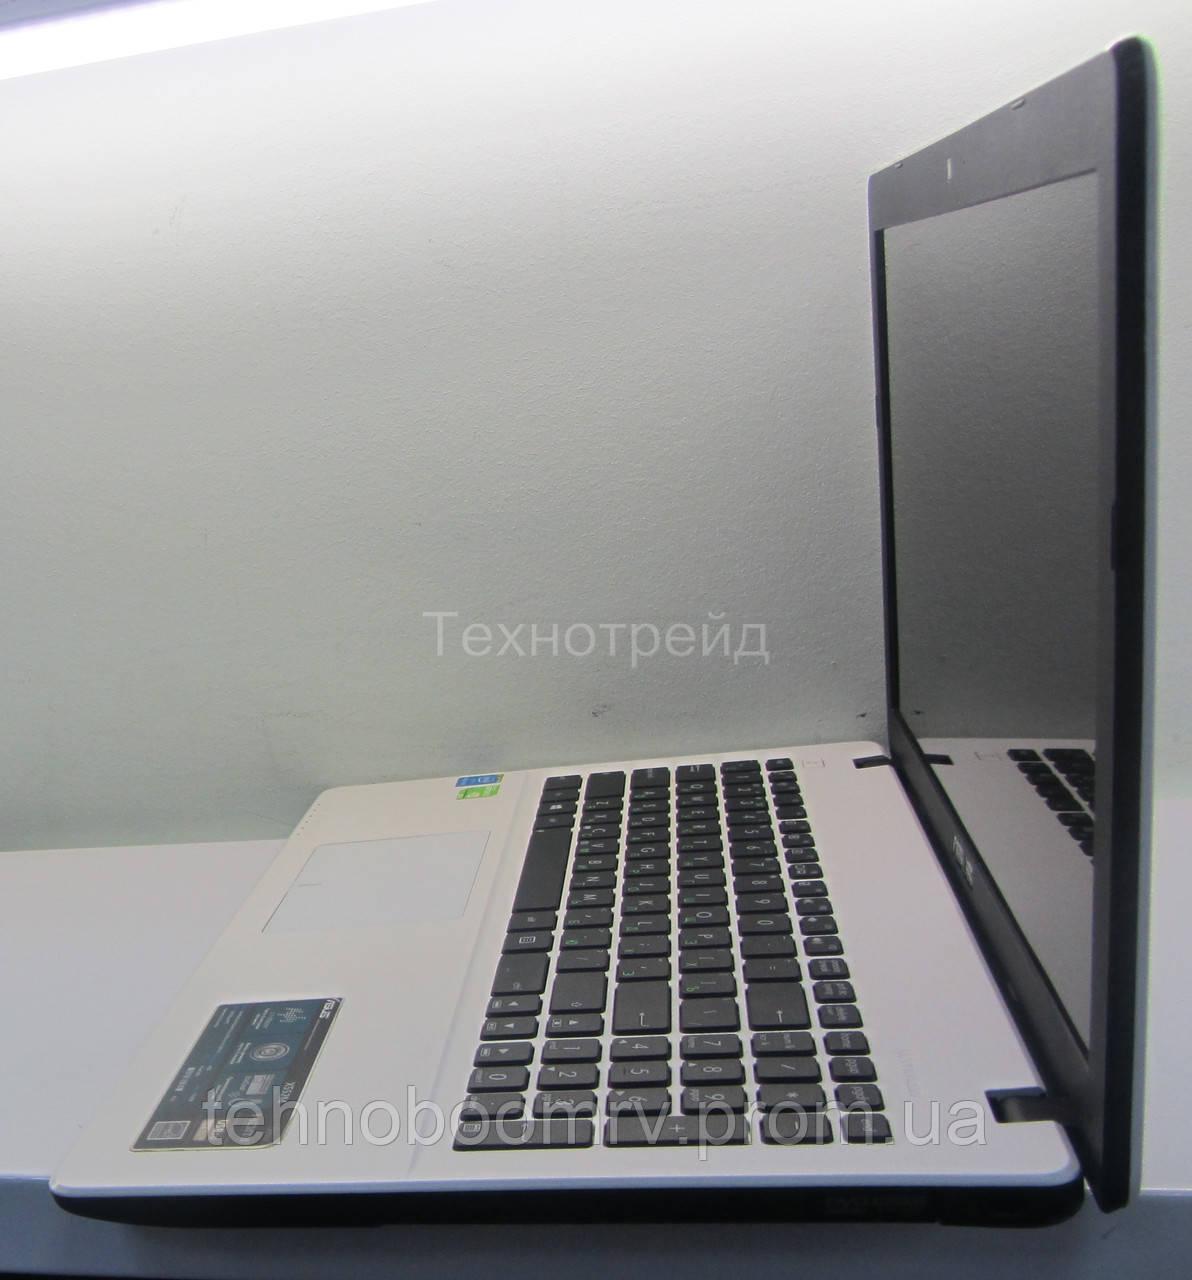 Asus X552M - 4ядра Intel Pentium N3540 2.66GHz/DDR3 4GB/GT 810M 1GB 4